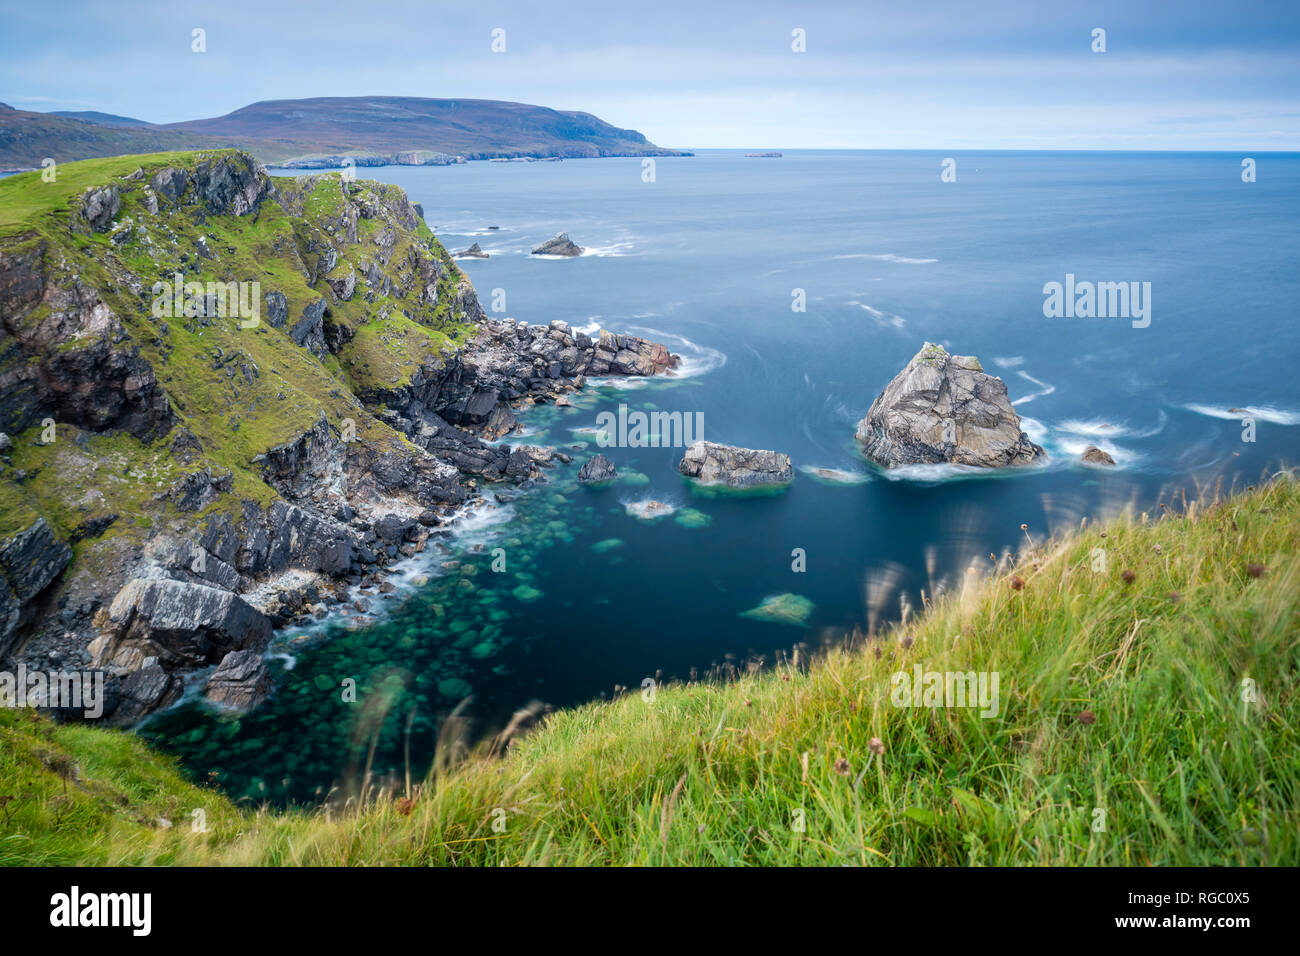 UK, Scotland, Highland, North Coast 500, Faraid Head near Durness - Stock Image